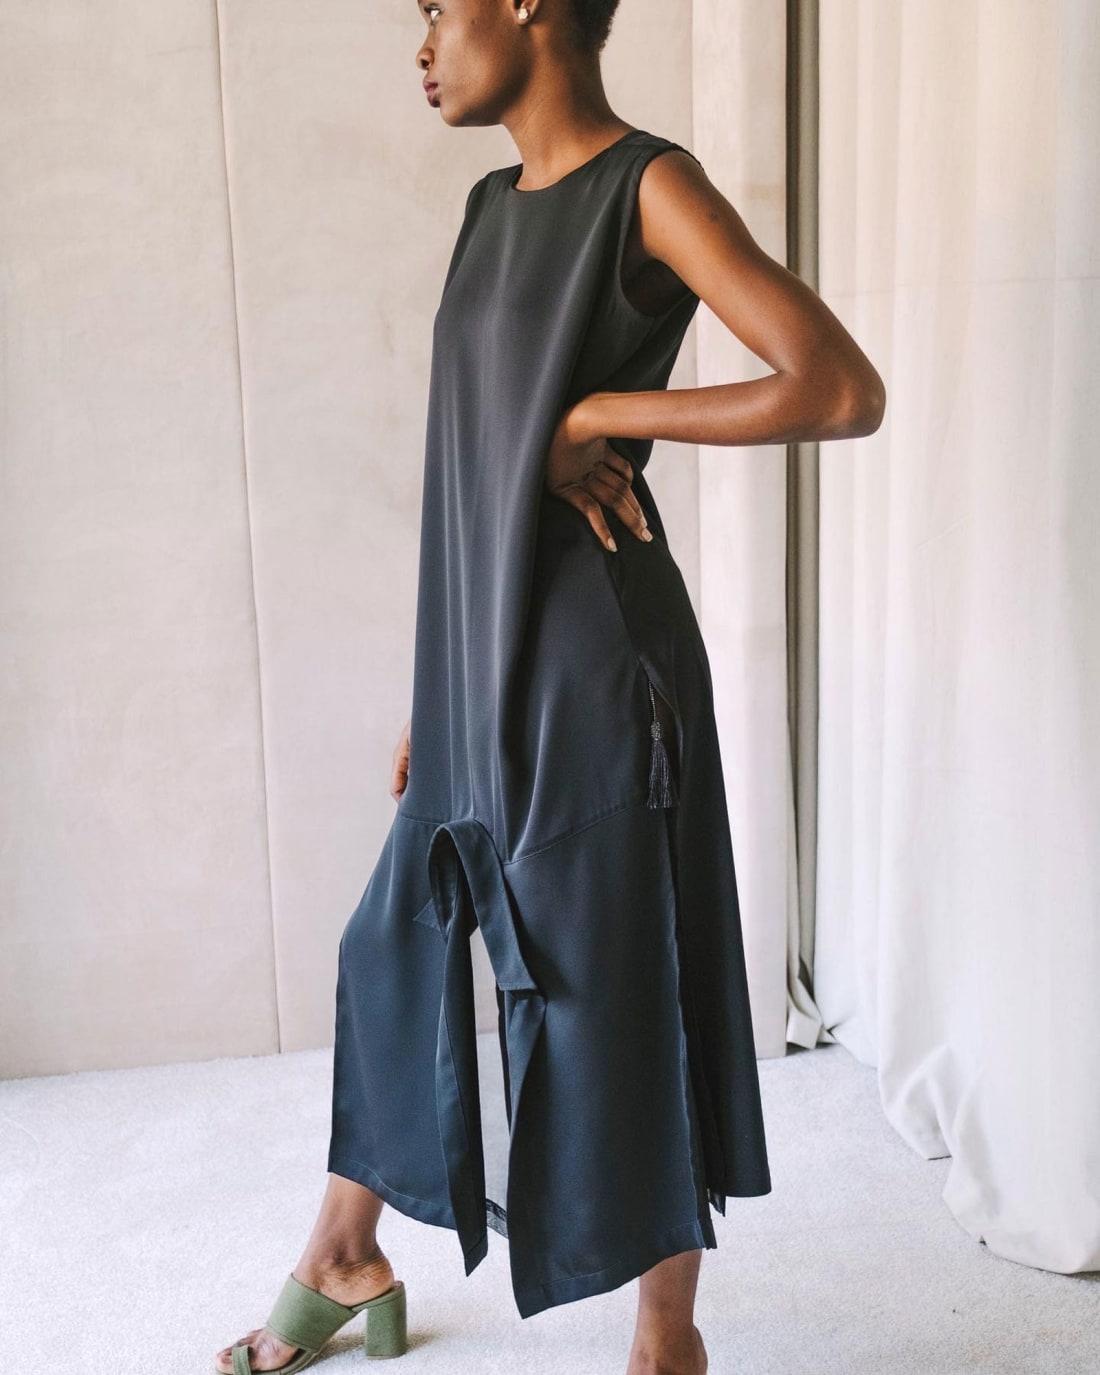 RESTRICTED 01 naomi campbell ian audifferen nigeria fashion hnk spc intl